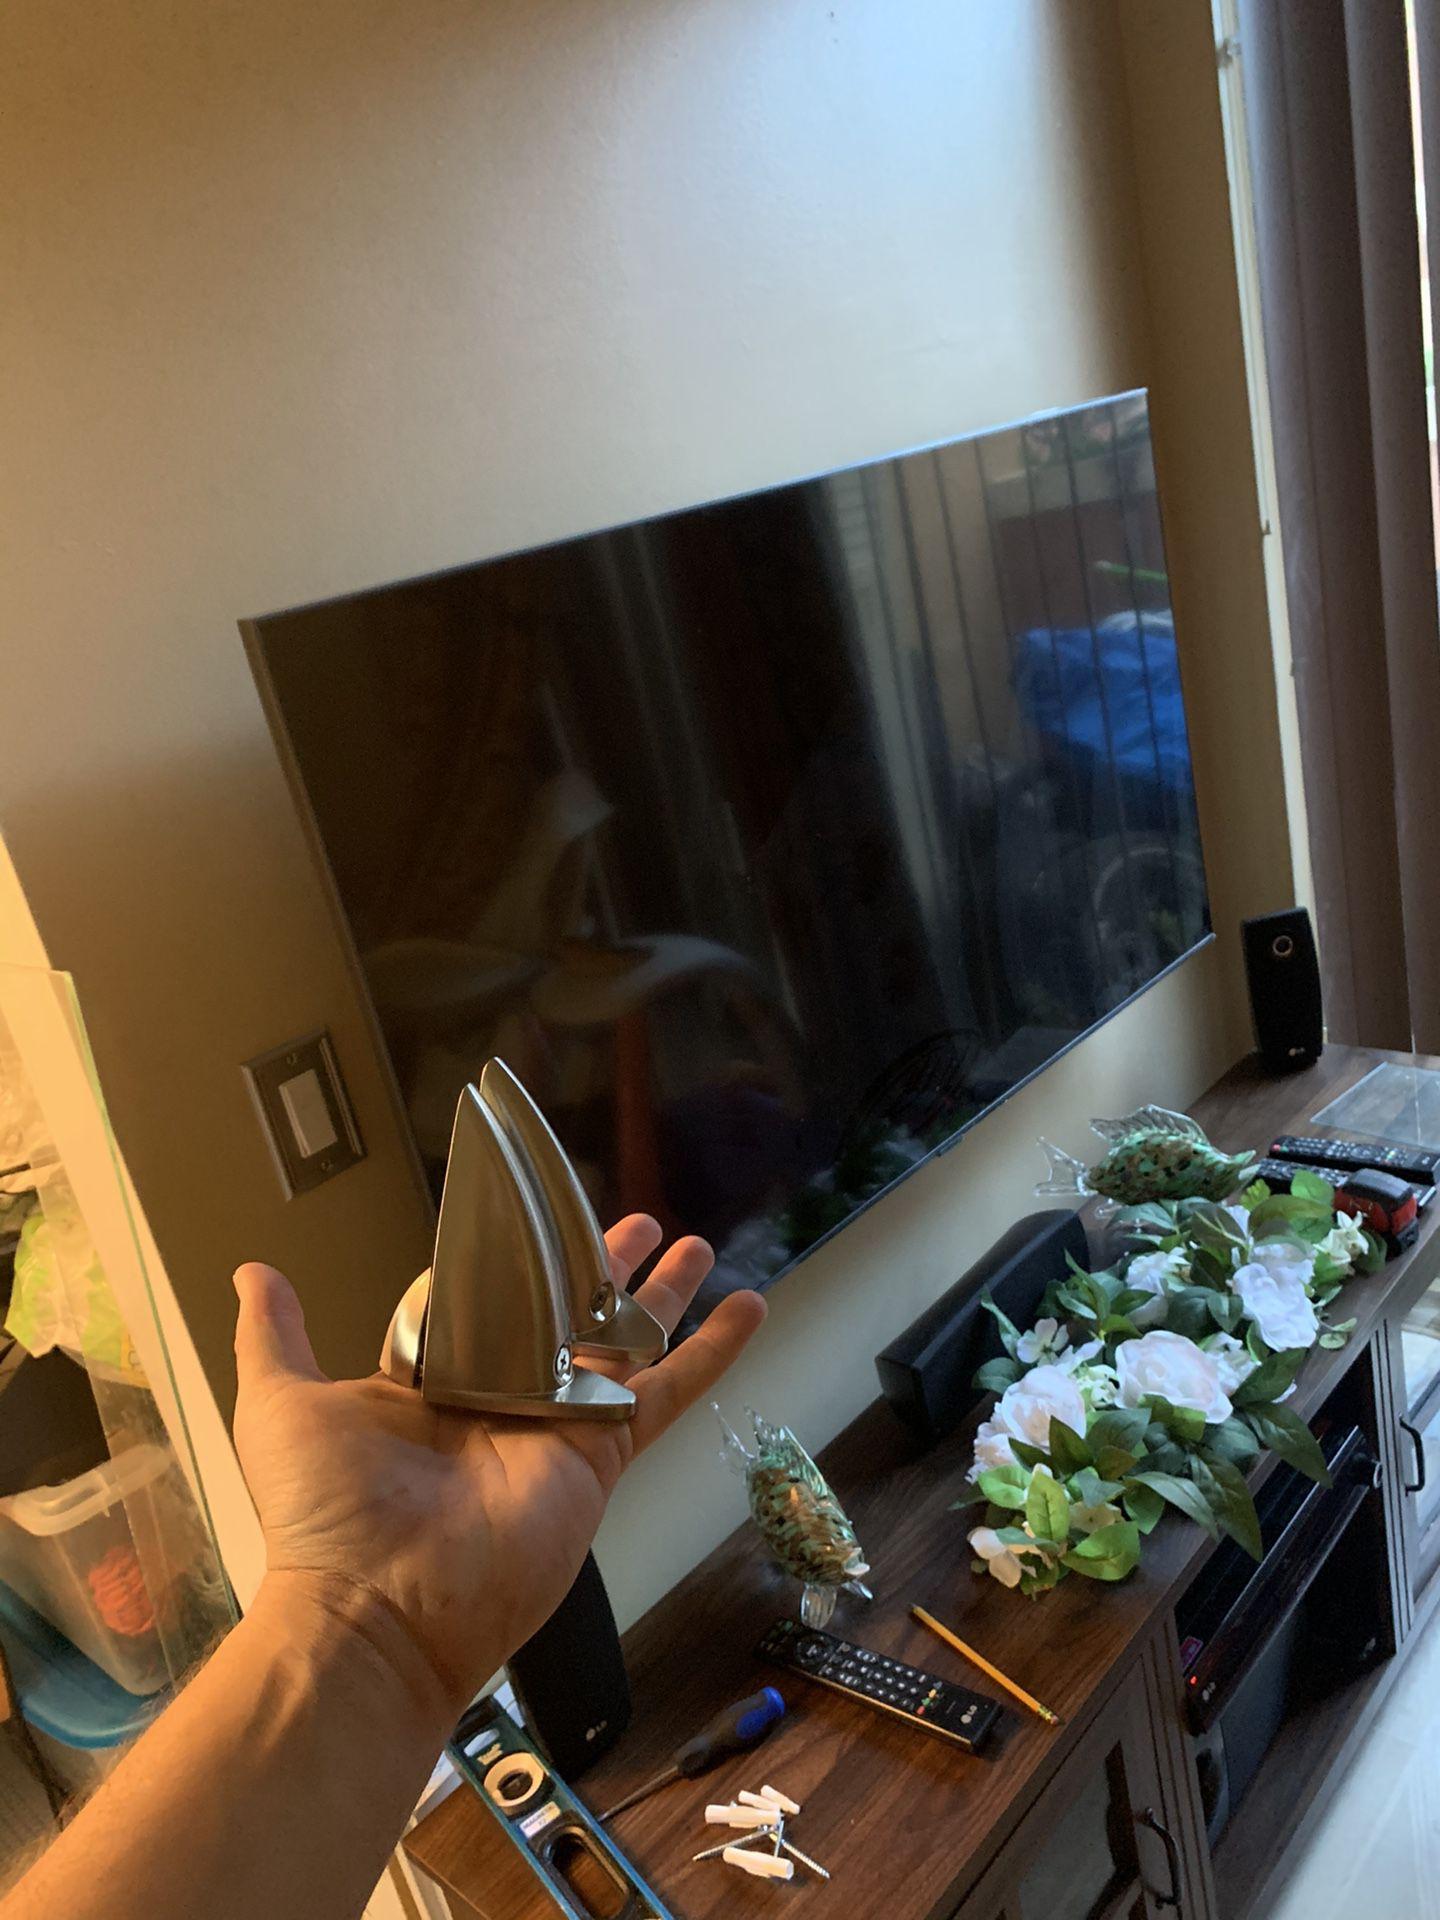 Glass shelves and brackets